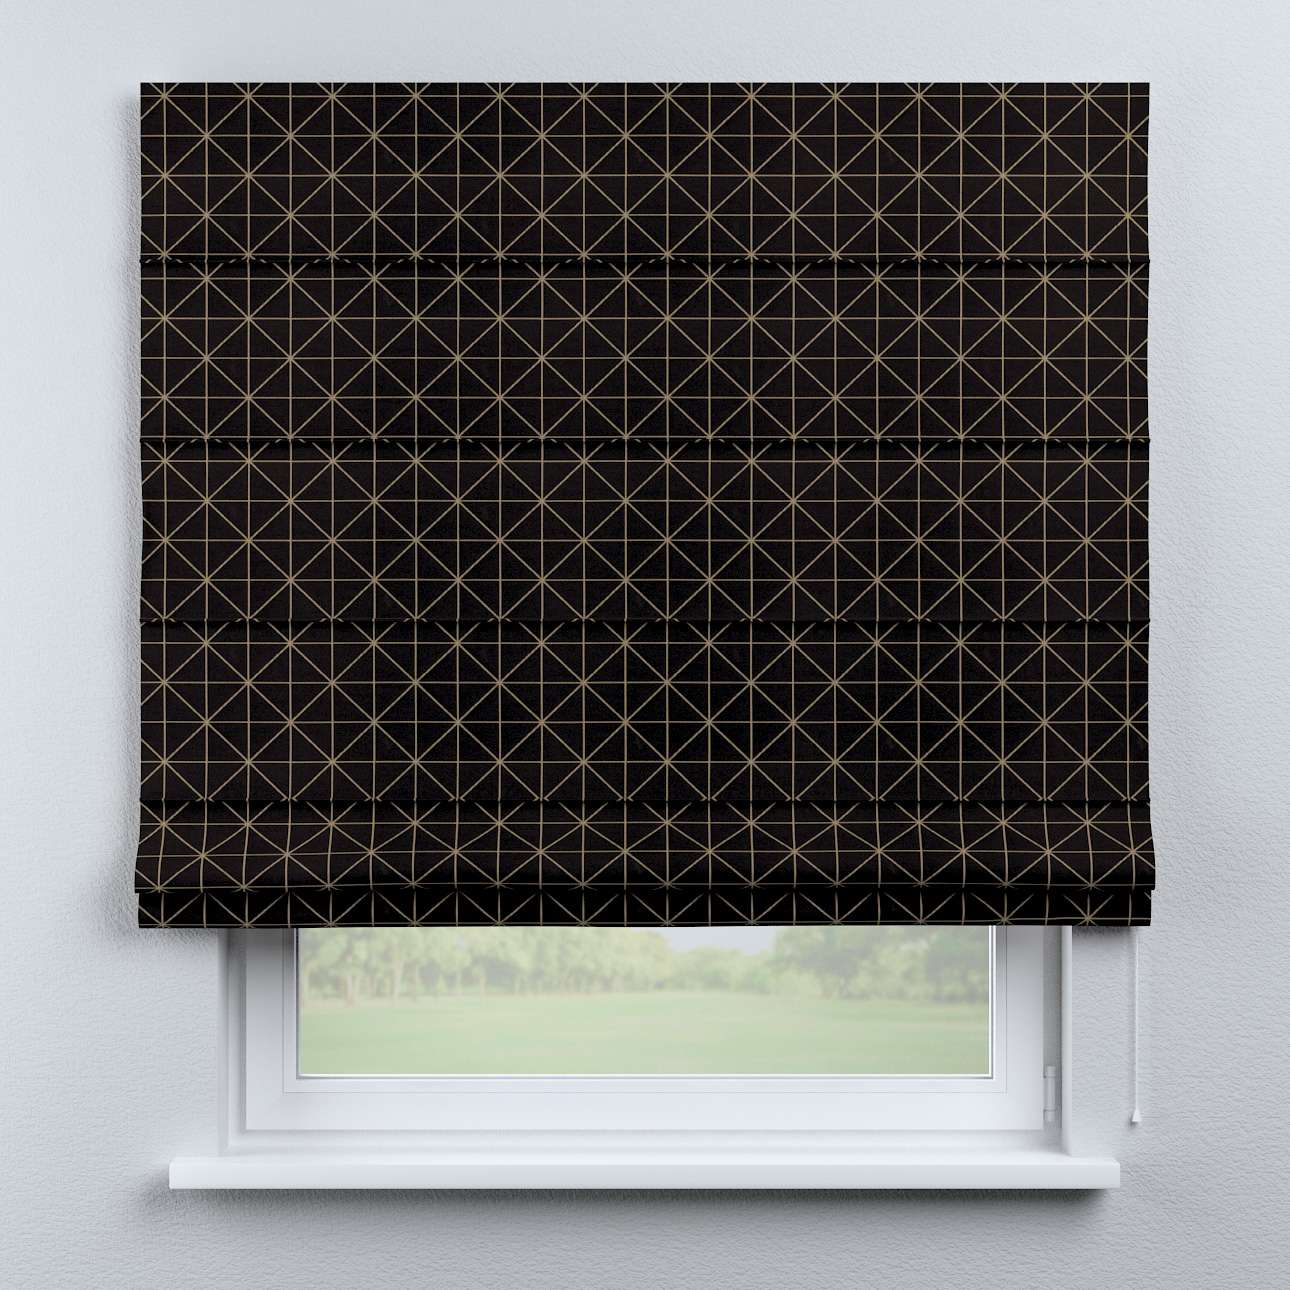 Capri roman blind in collection Black & White, fabric: 142-55